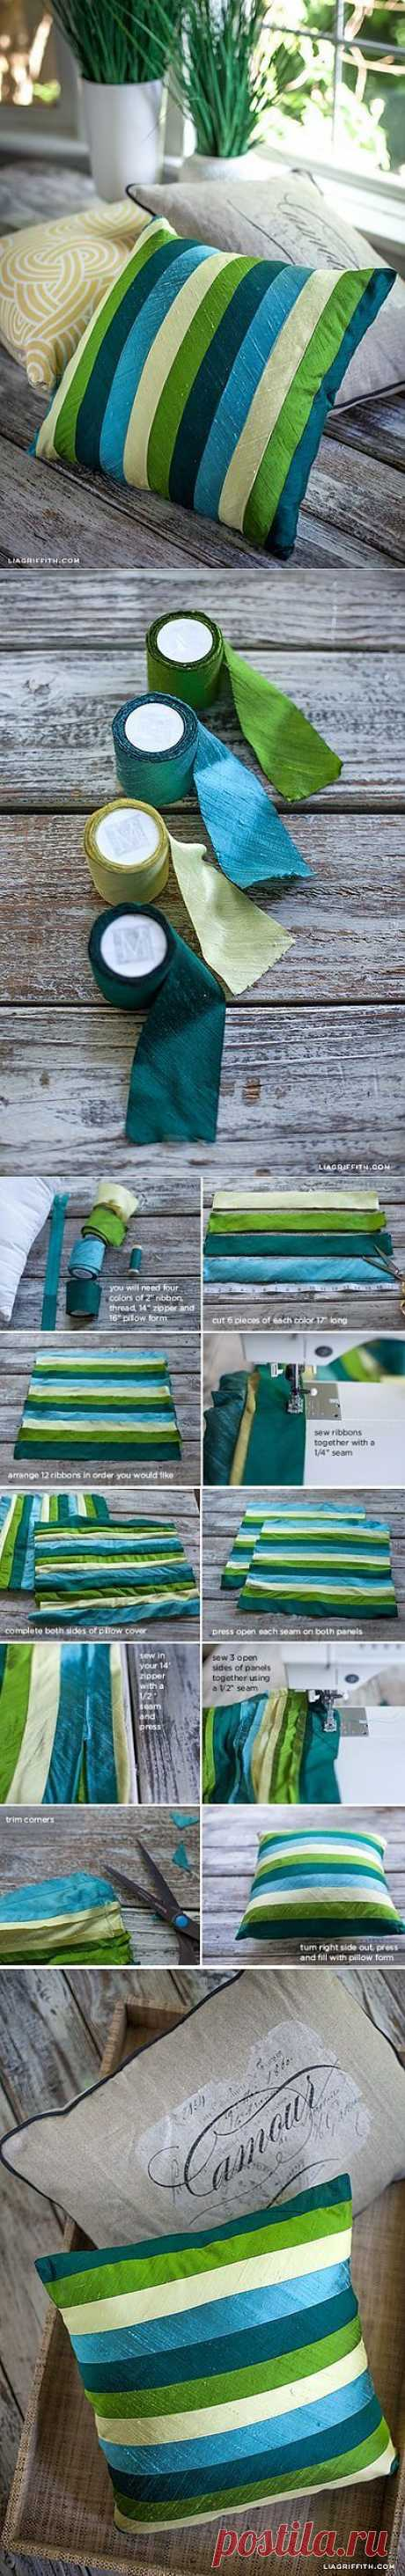 Красивый чехол на подушку из атласных лент   My Milady